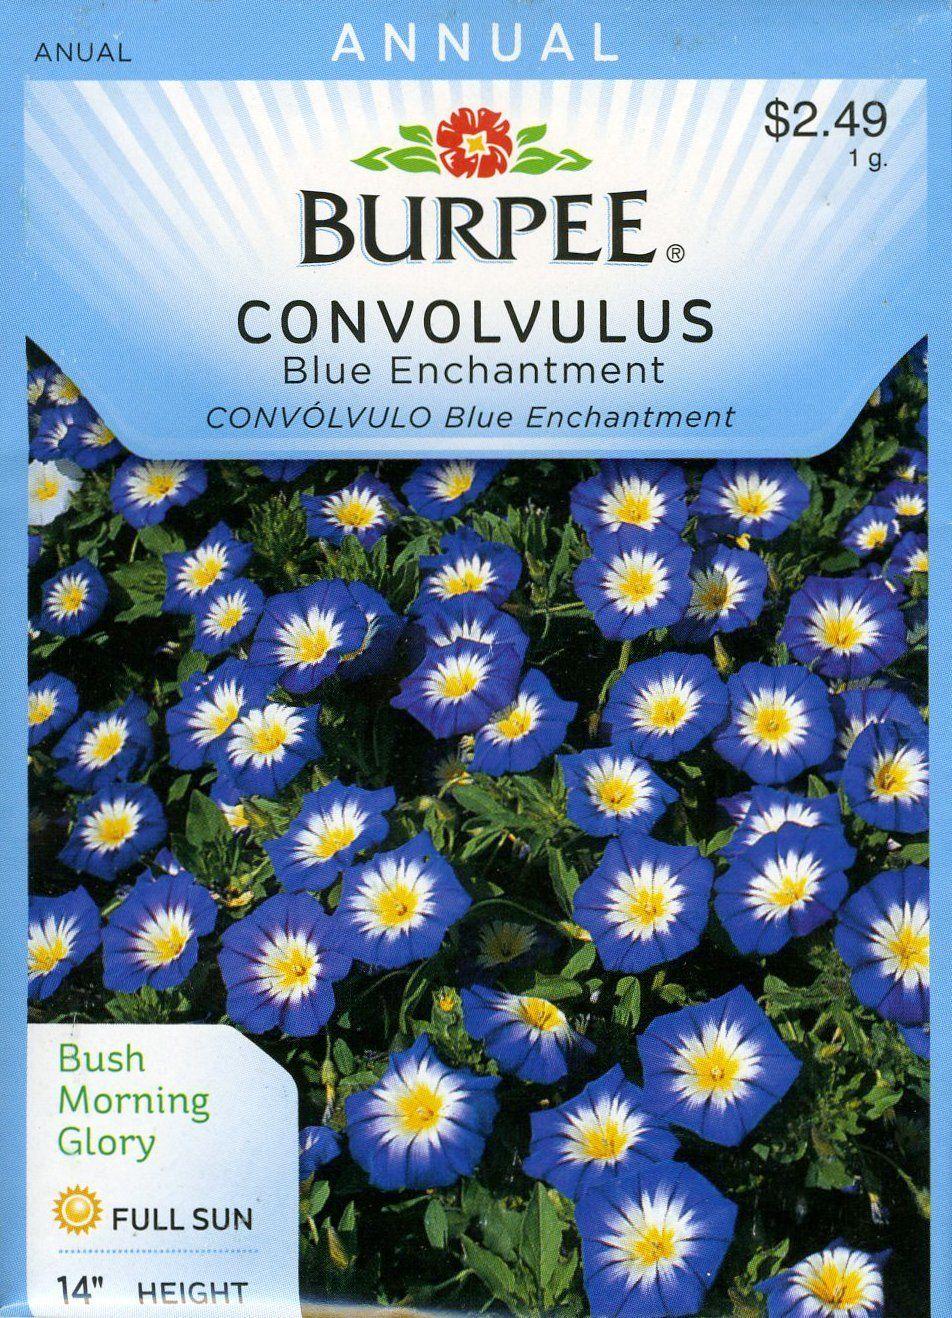 Burpee 48389 Convolvulus Blue Enchantment Seed Packet: Amazon co uk